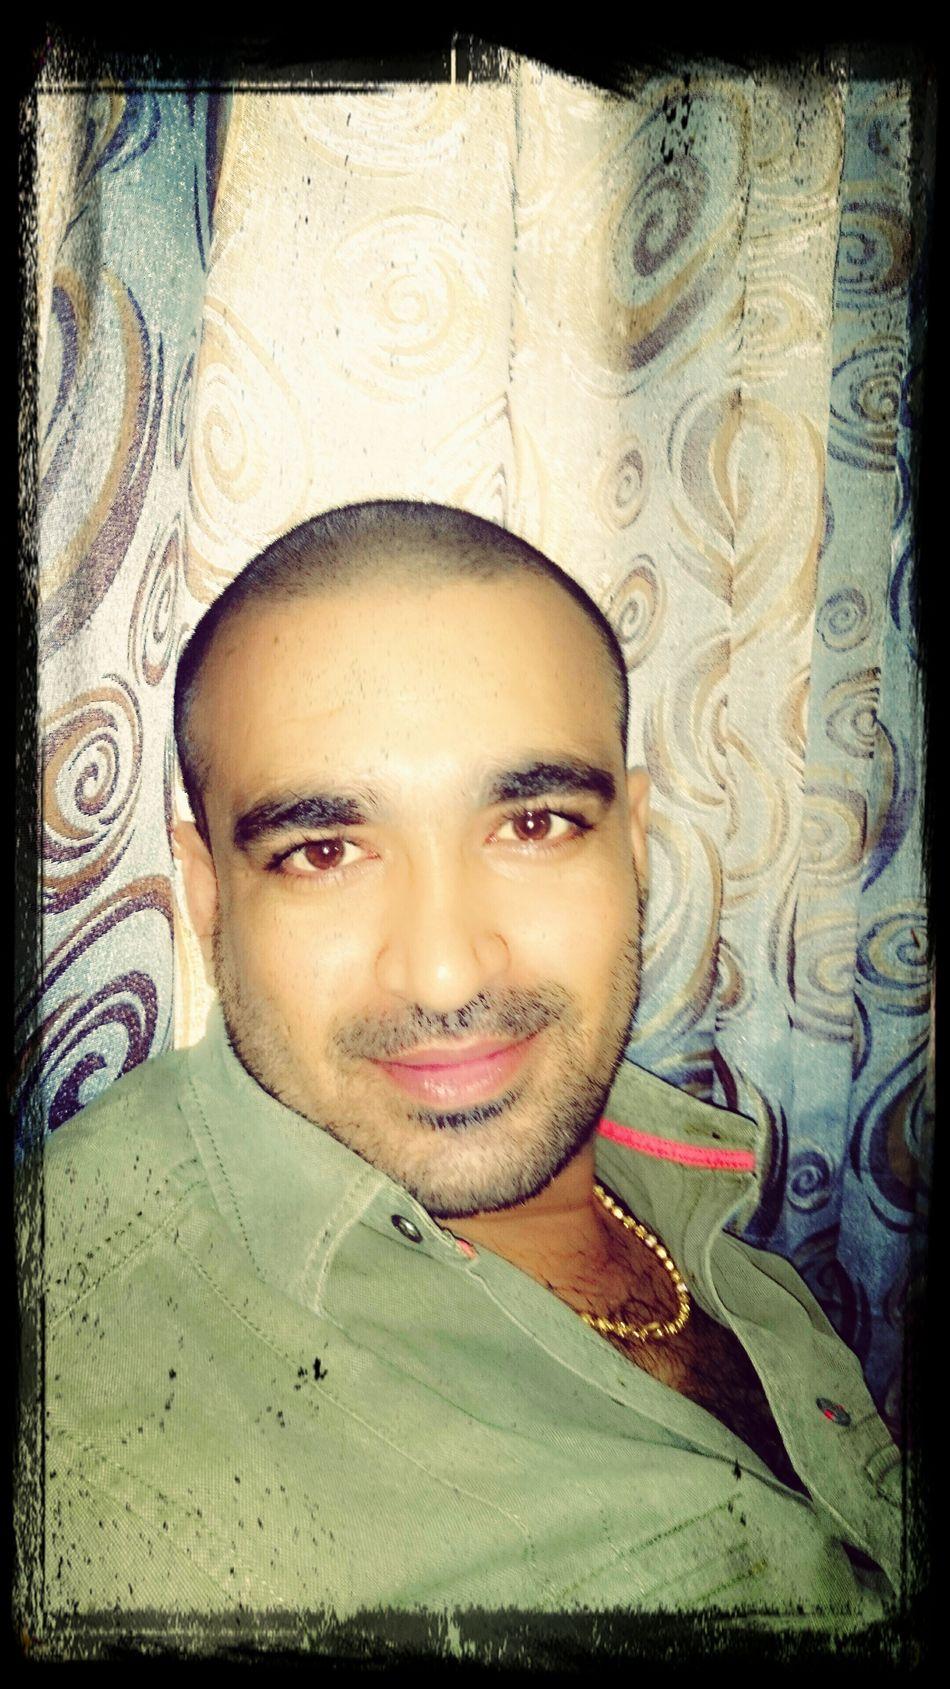 kuduku.8989@gamil.com Hot Popular Photo Model I Take Myself Very Seriously